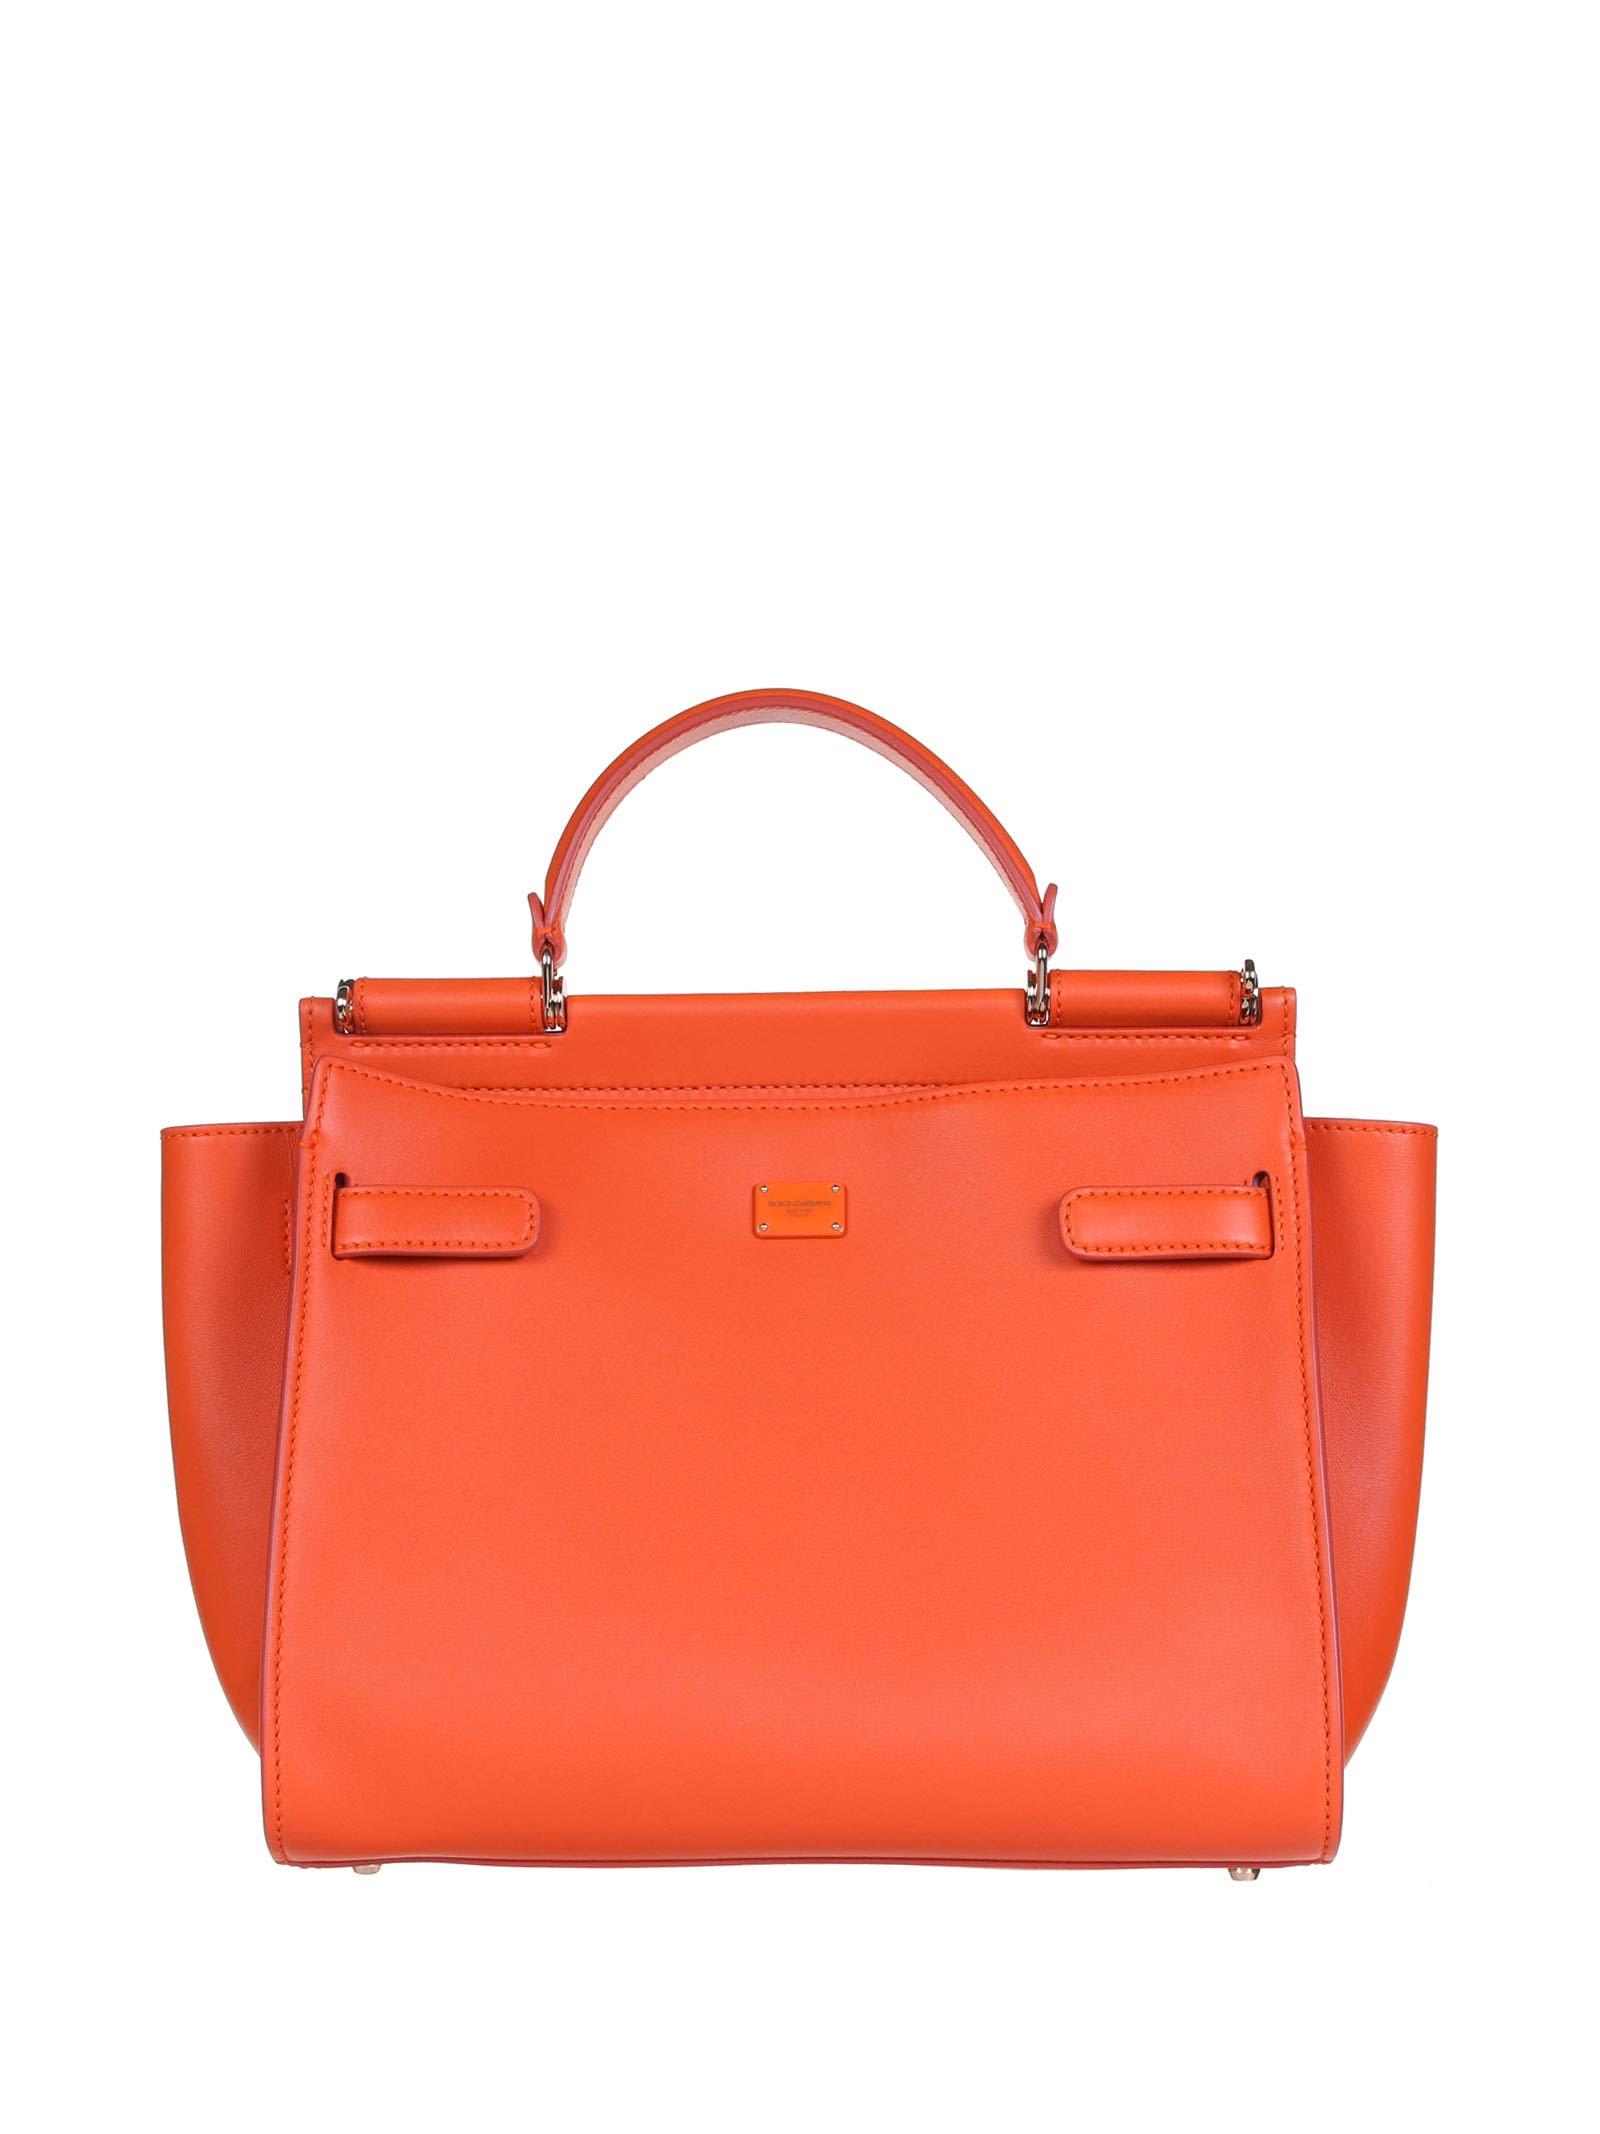 Dolce & Gabbana Bags SICILY SOFT BAG